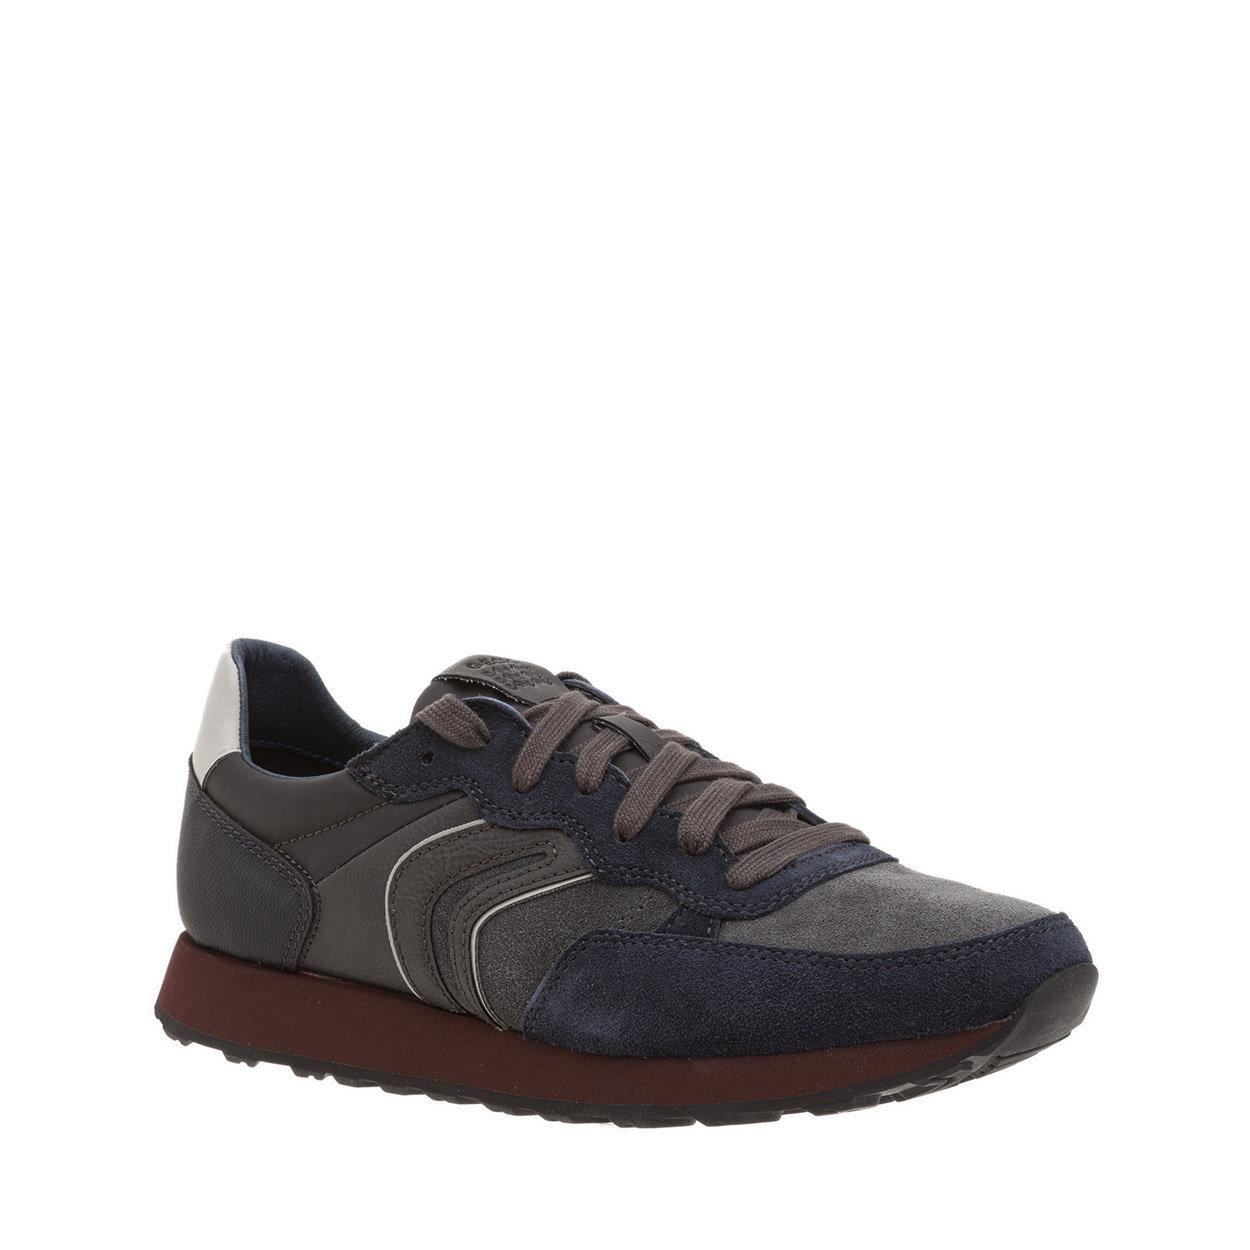 Sneakers Vincit B multicolor GEOX SCARPE Acquista su Ventis.